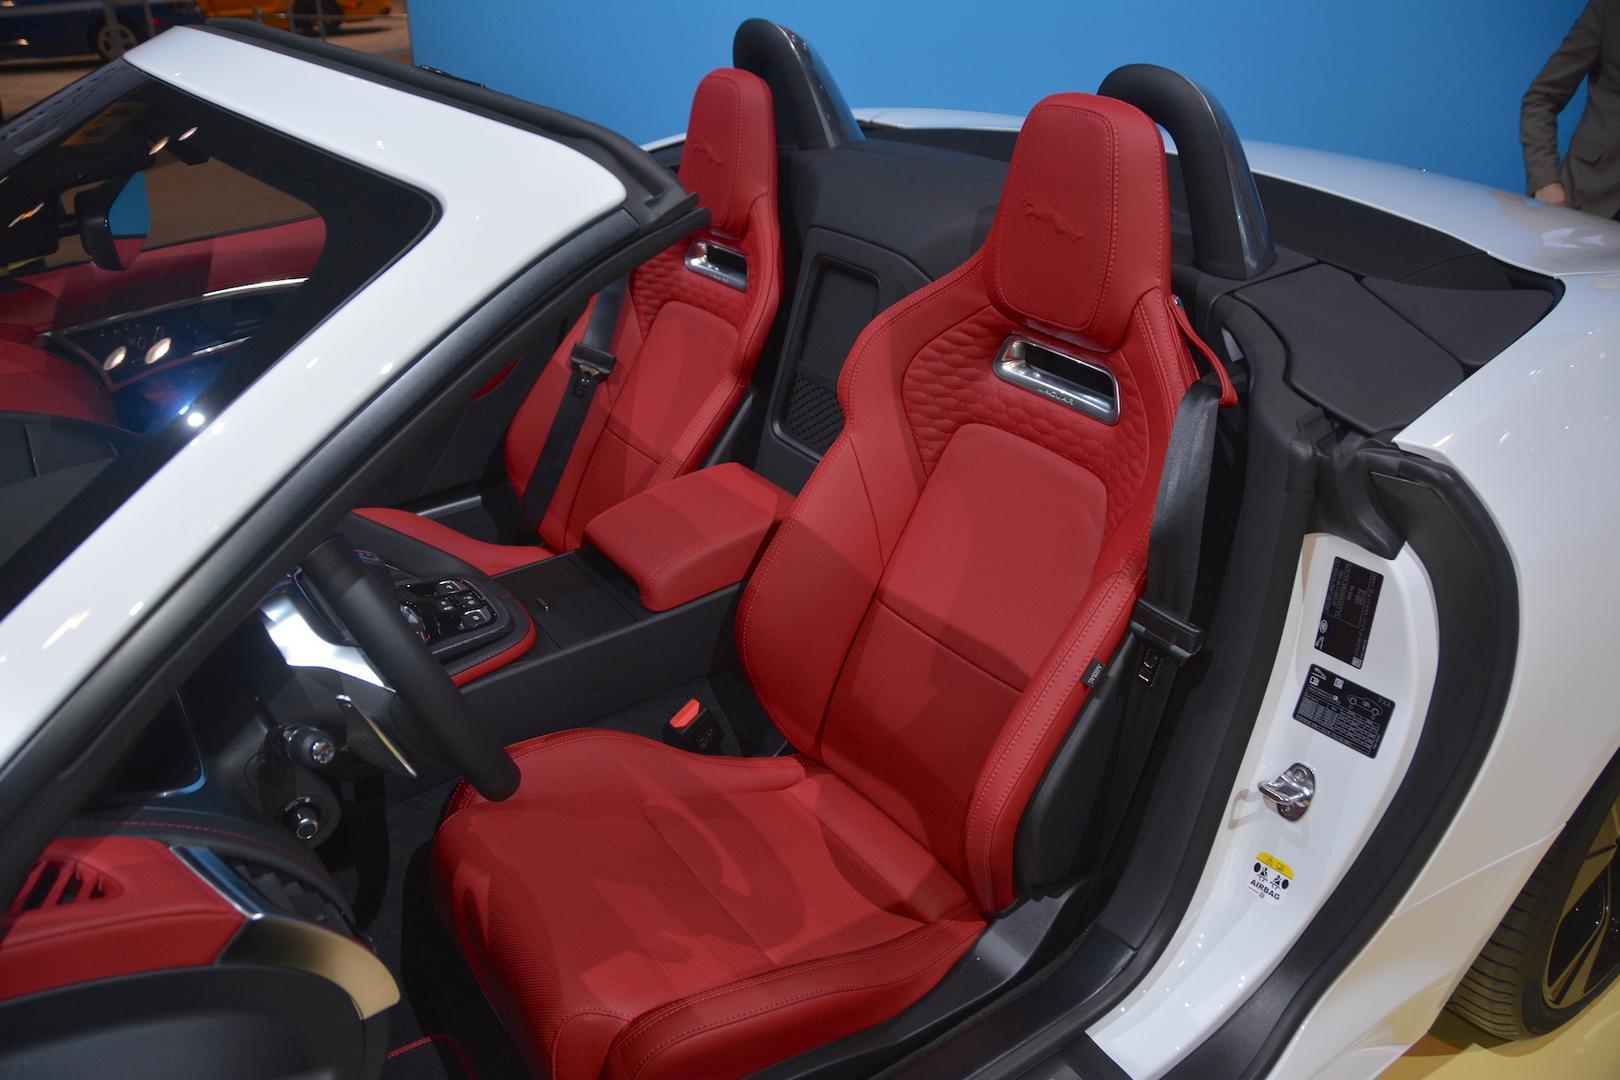 2020 Jaguar F-Type Convertible Seats